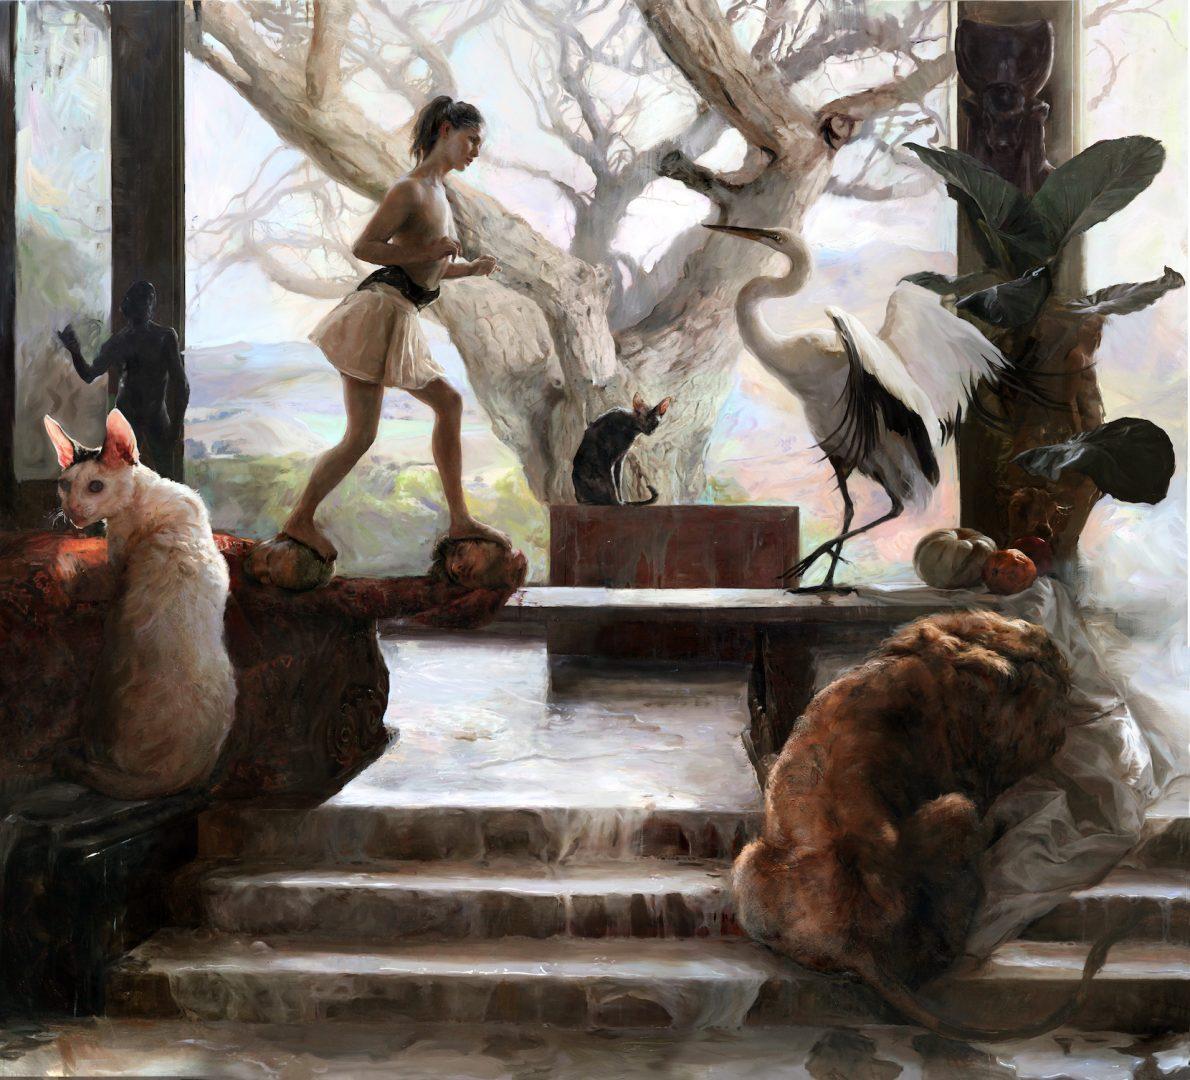 Guillermo Lorca, The Enccounter, 2018-19, oil and acrylic on canvas, 210x230 cm